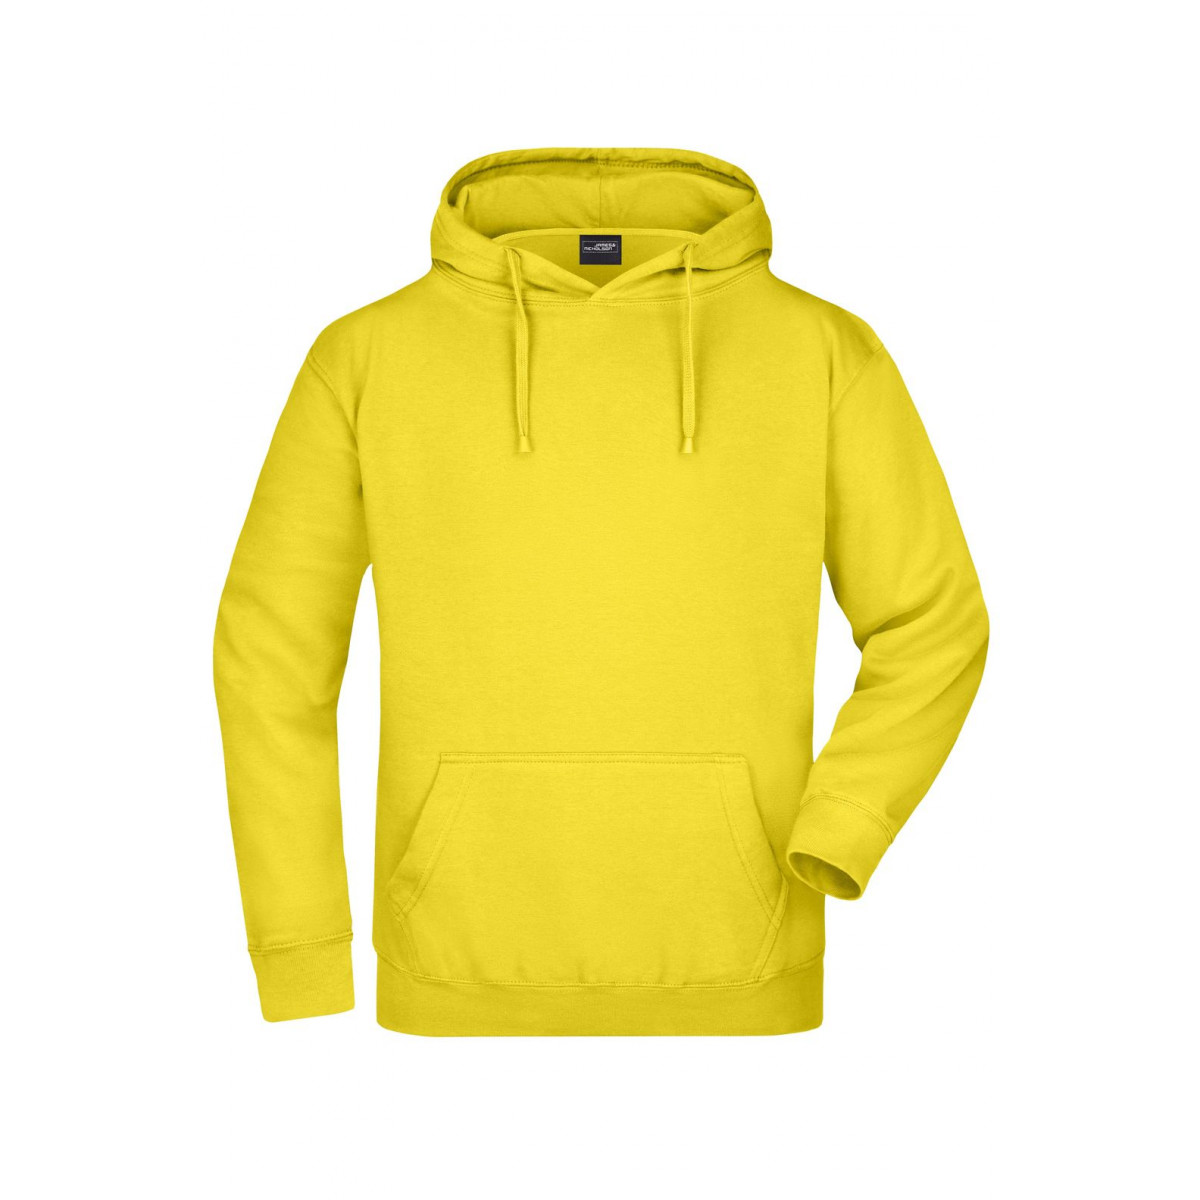 Толстовка мужская JN047 Hooded Sweat - Ярко-желтый